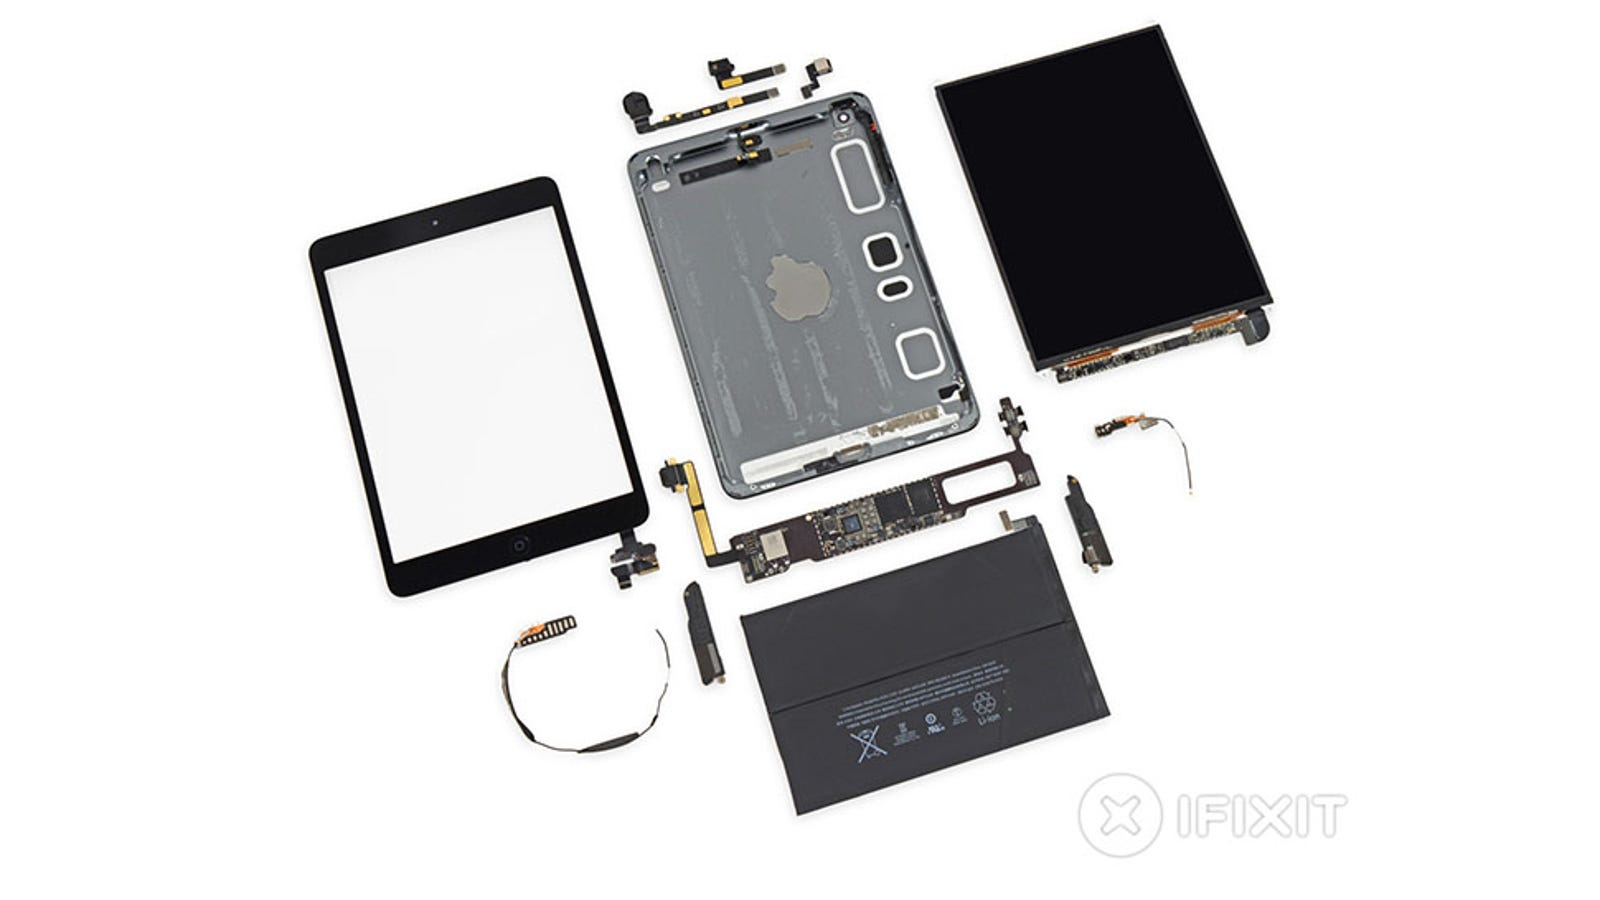 iPad Mini With Retina Display Spills Its Glorious High ...Ipad Mini Retina Size